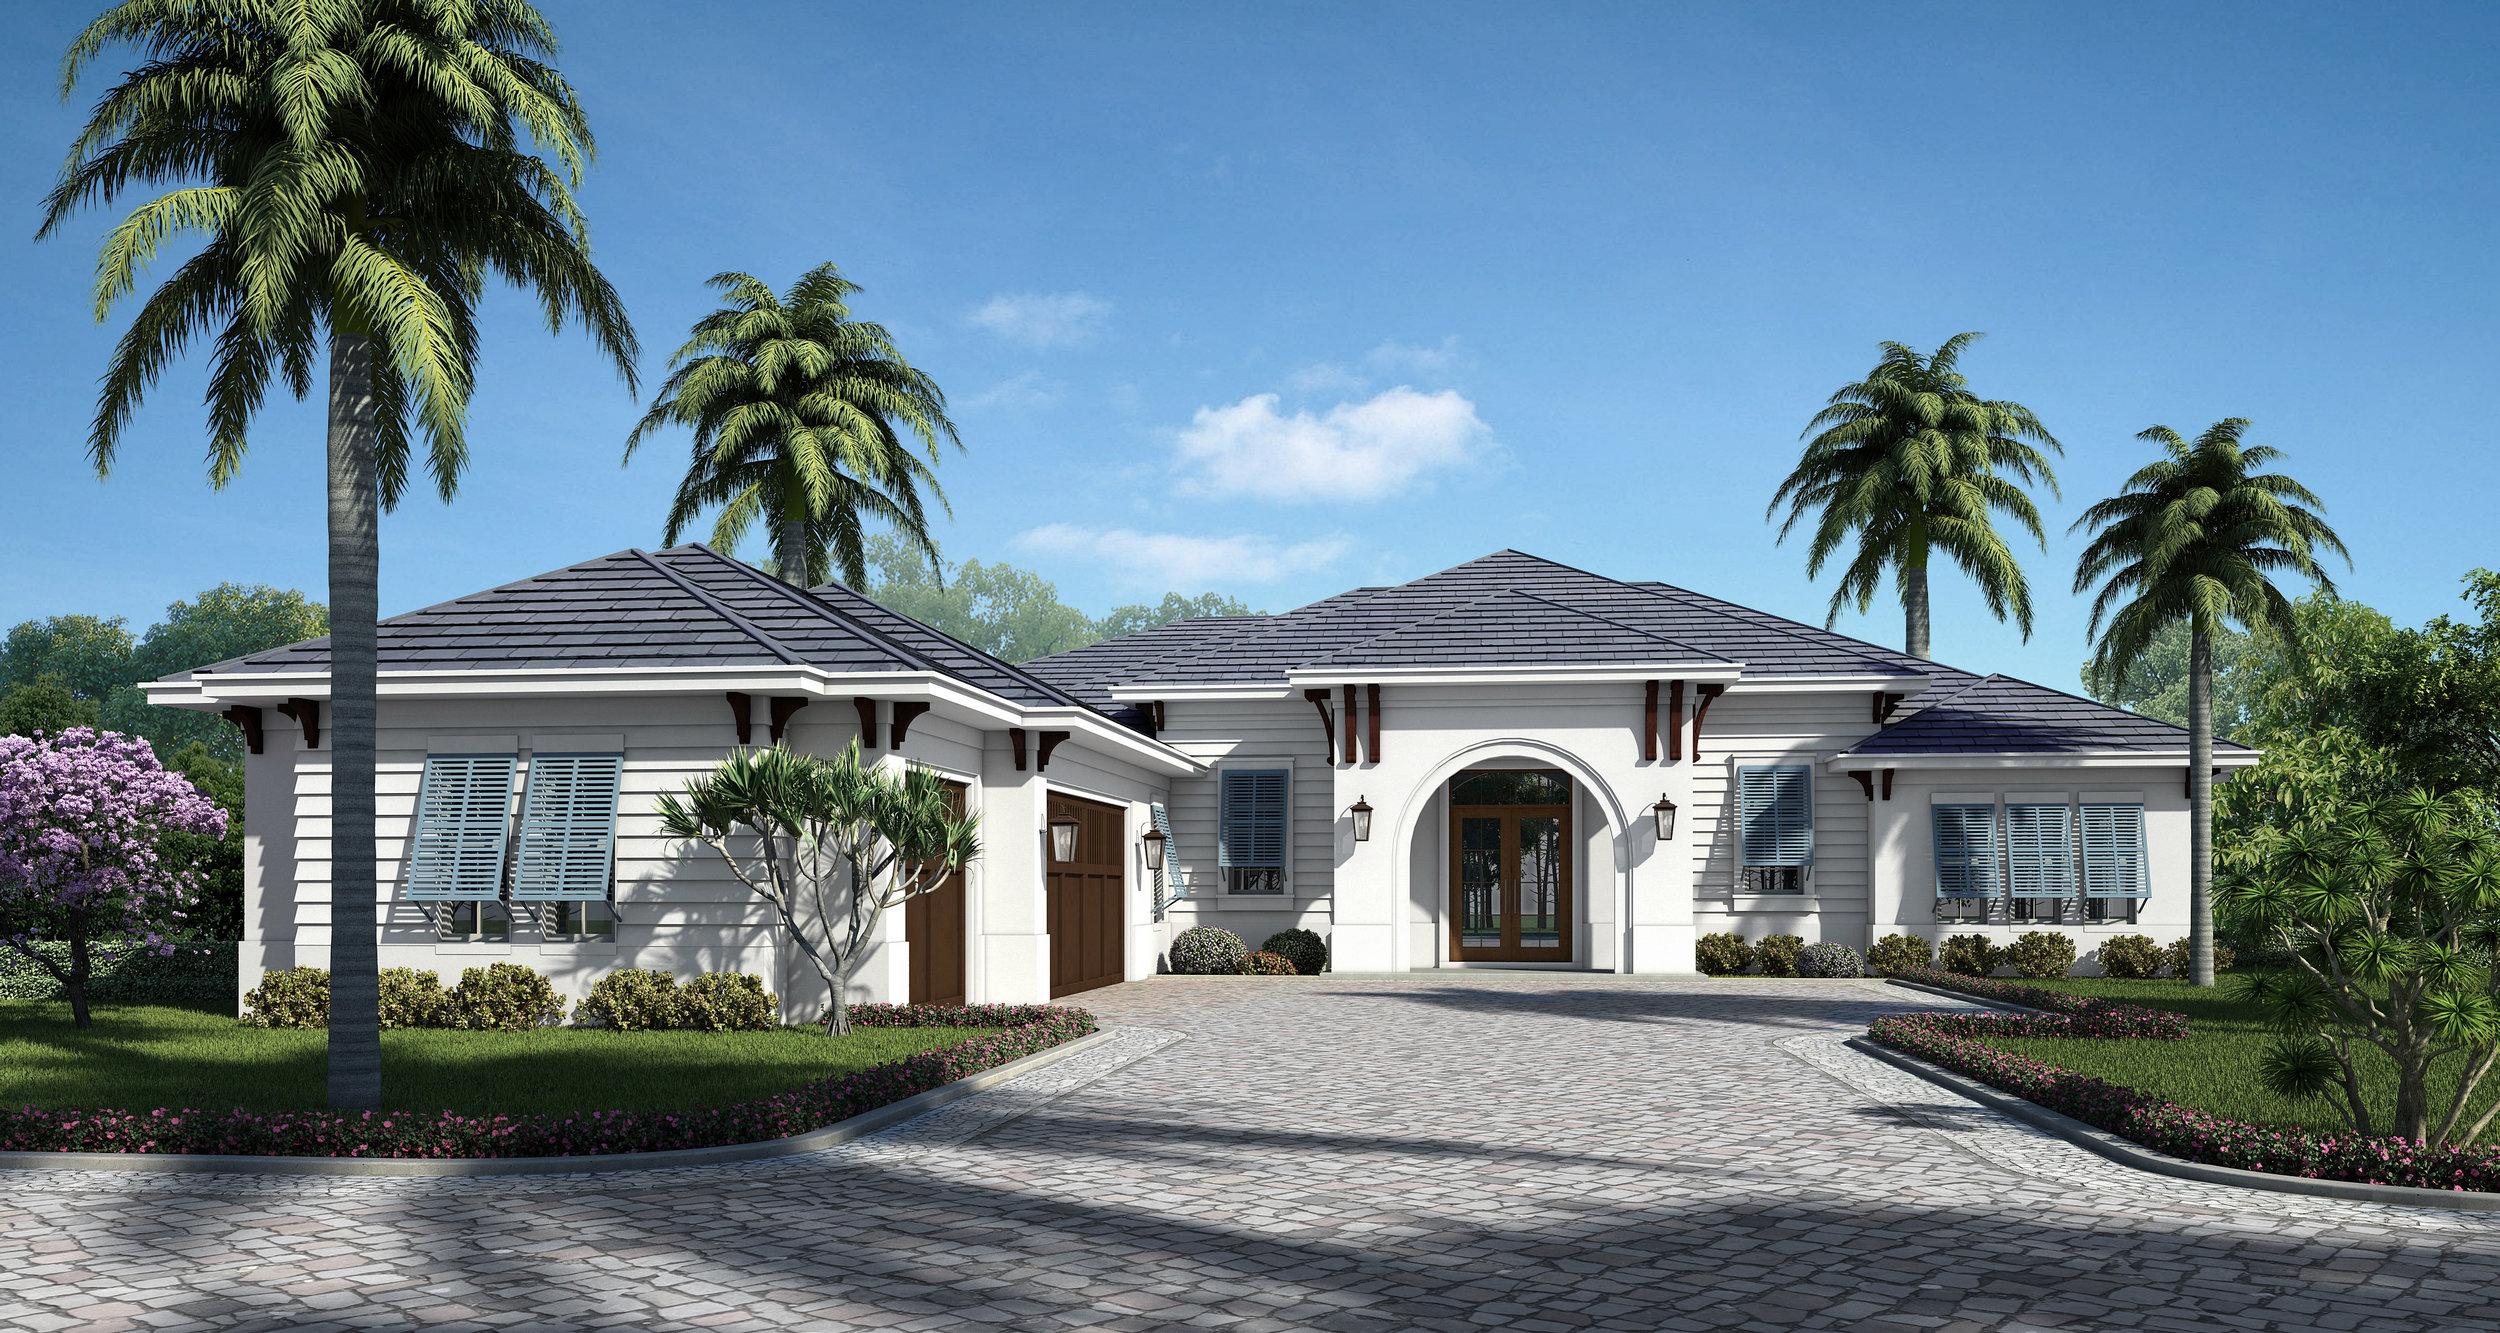 The Antigua